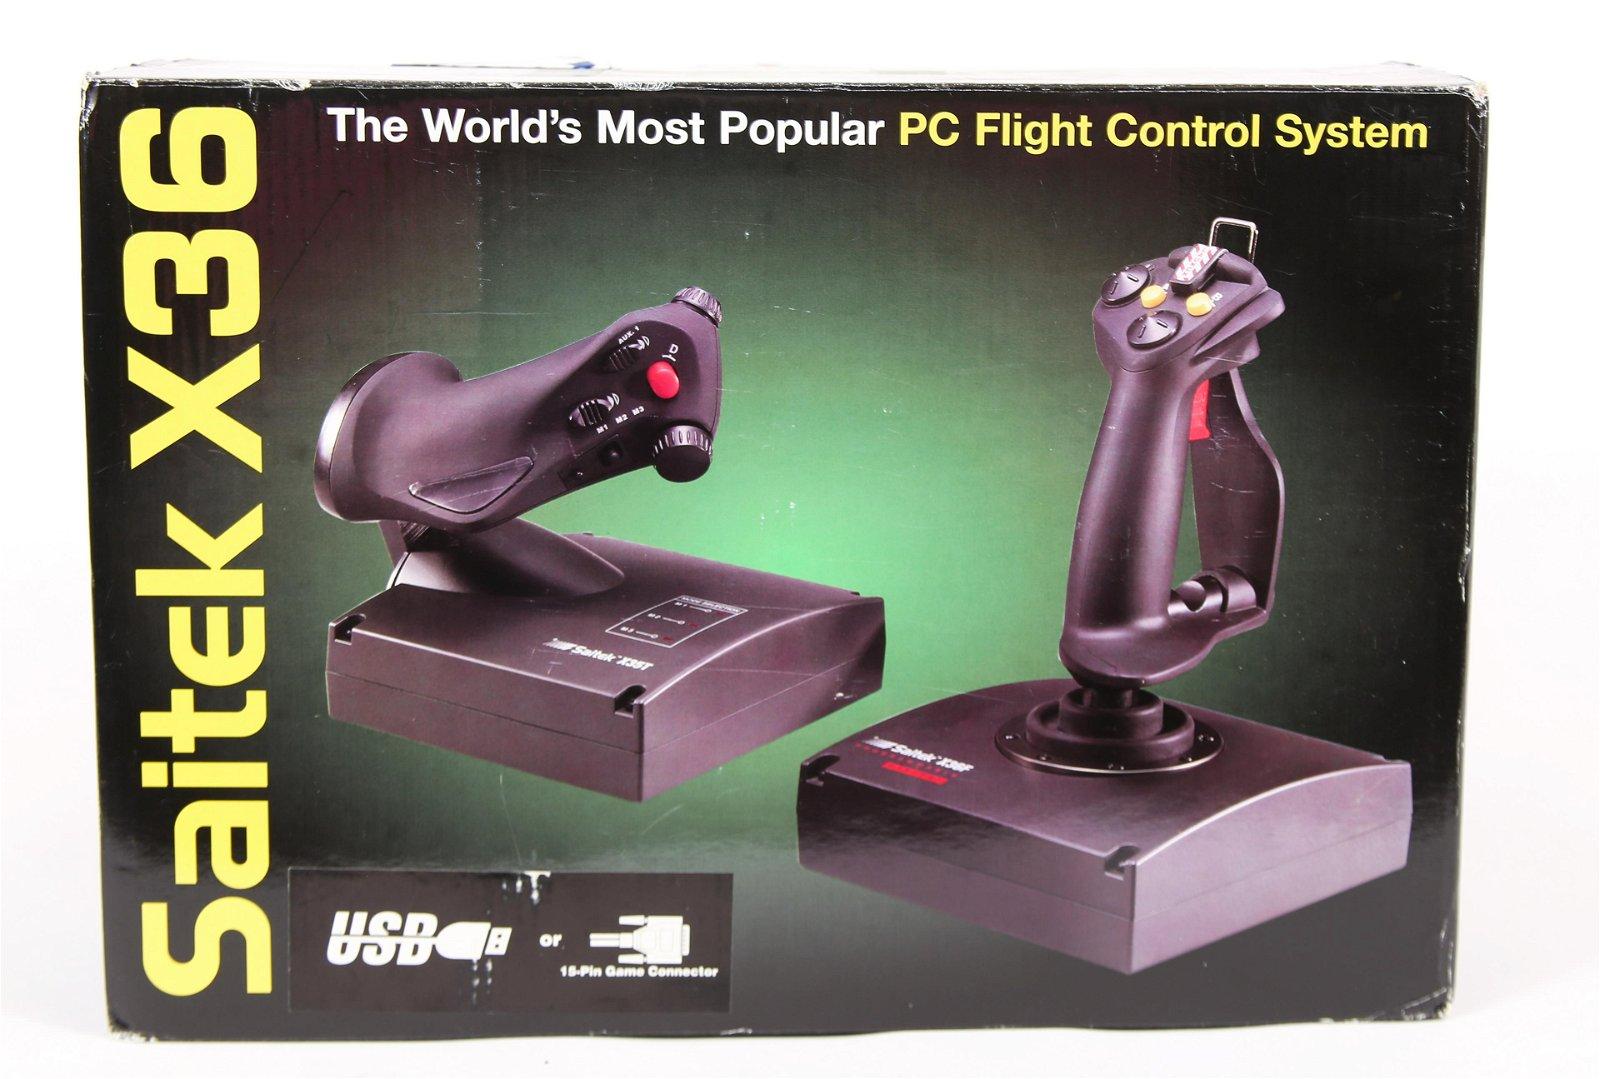 SAITEK X36 PC FLIGHT CONTROL SYSTEM